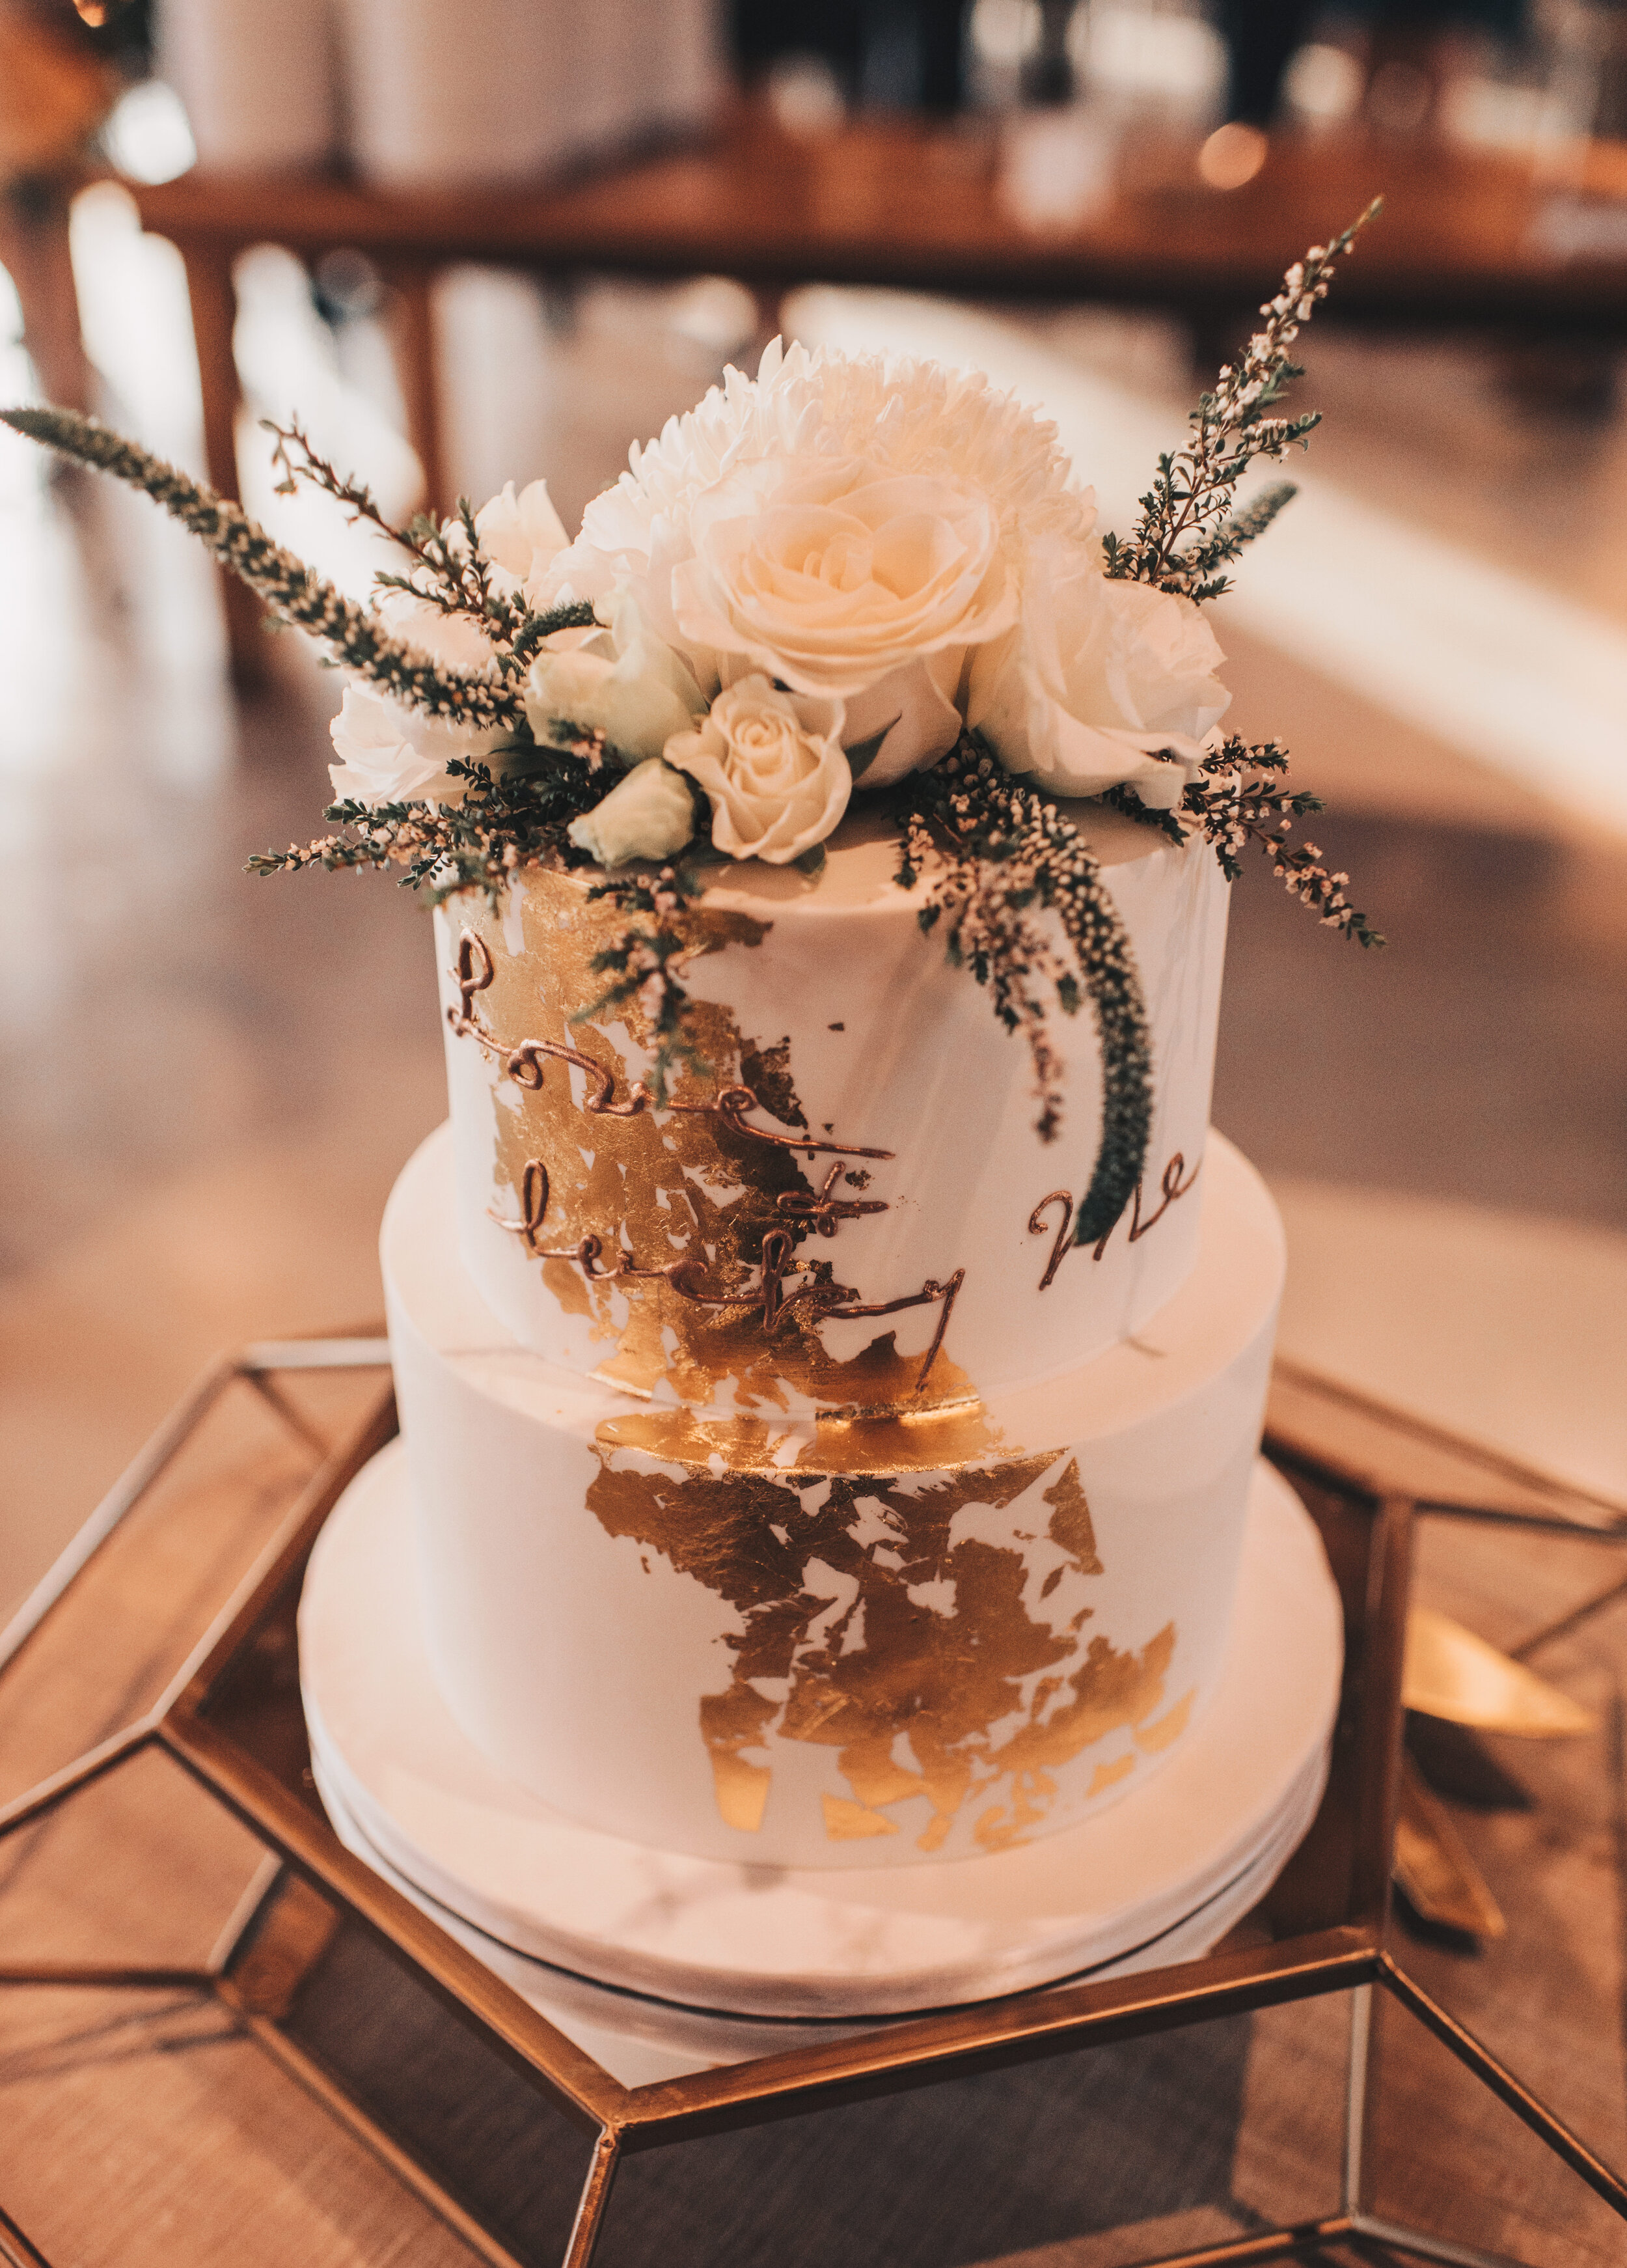 Modern Industrial Wedding, The Brix on the Fox, The BRIX, Chicago Industrial Wedding, Modern Midwest Wedding, The Brix on the Fox Wedding, The BRIX Wedding, Modern Wedding Cake